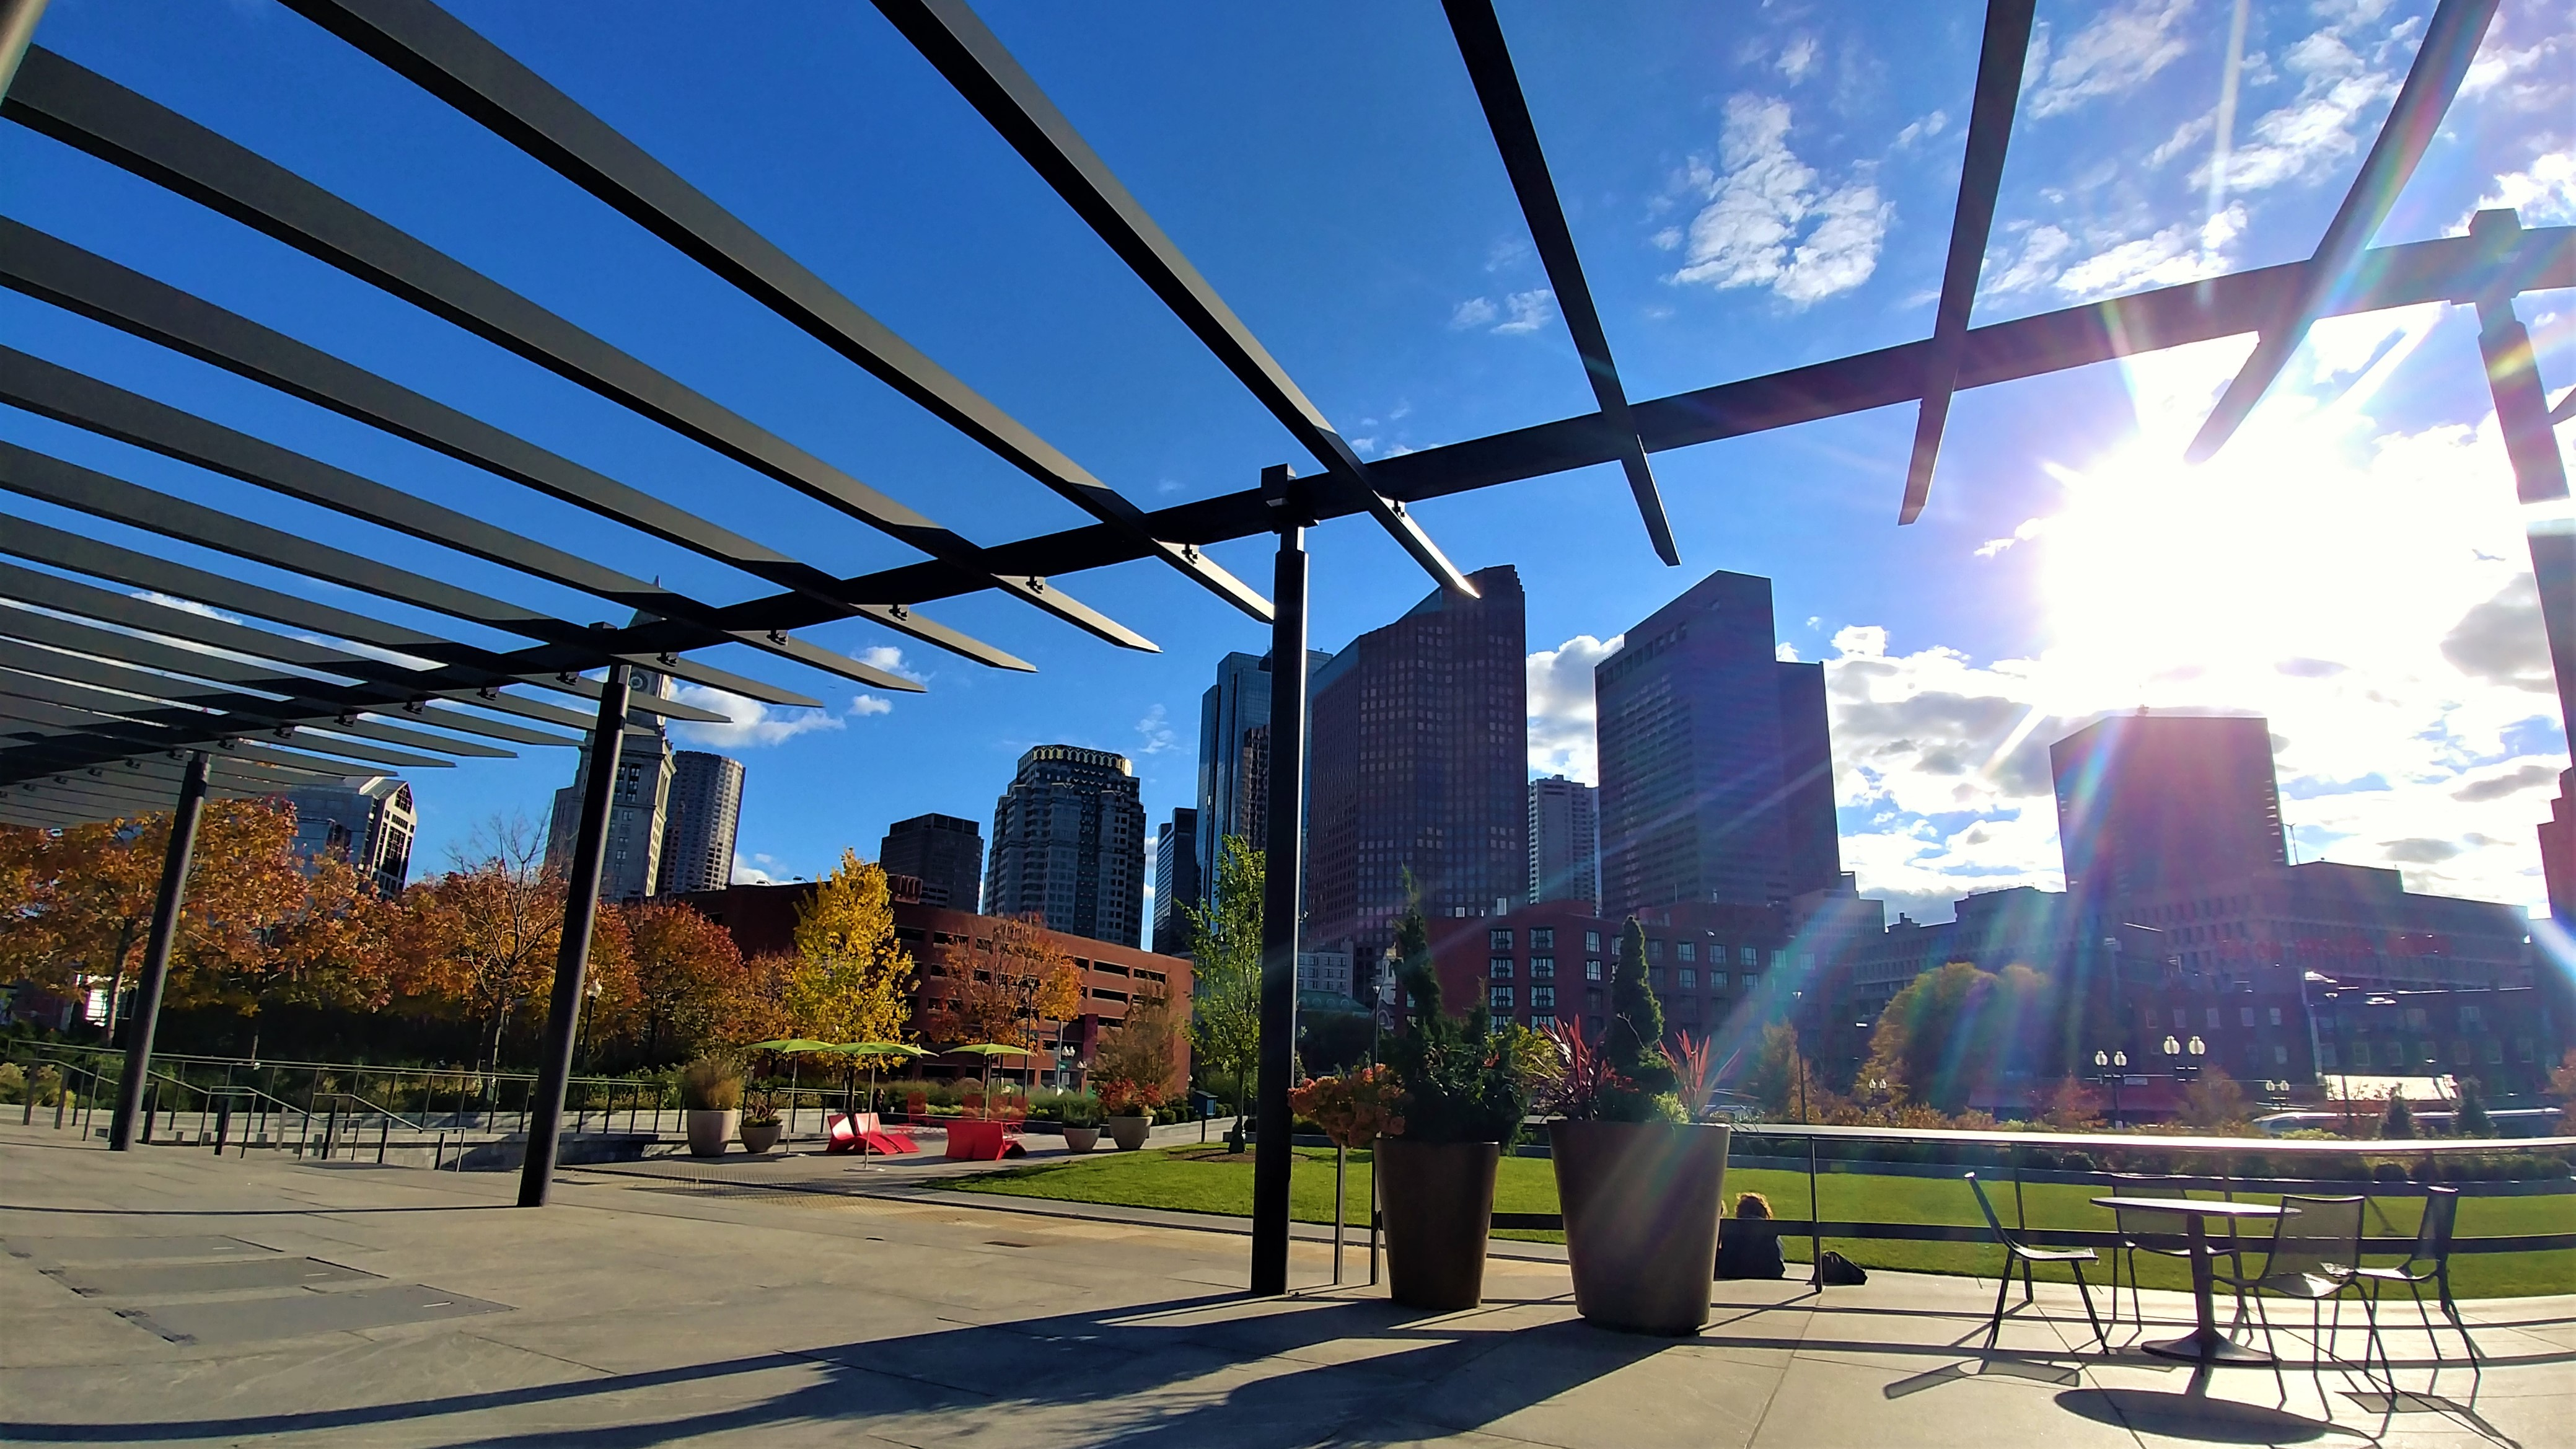 boston automne usa road-trip blog voyage